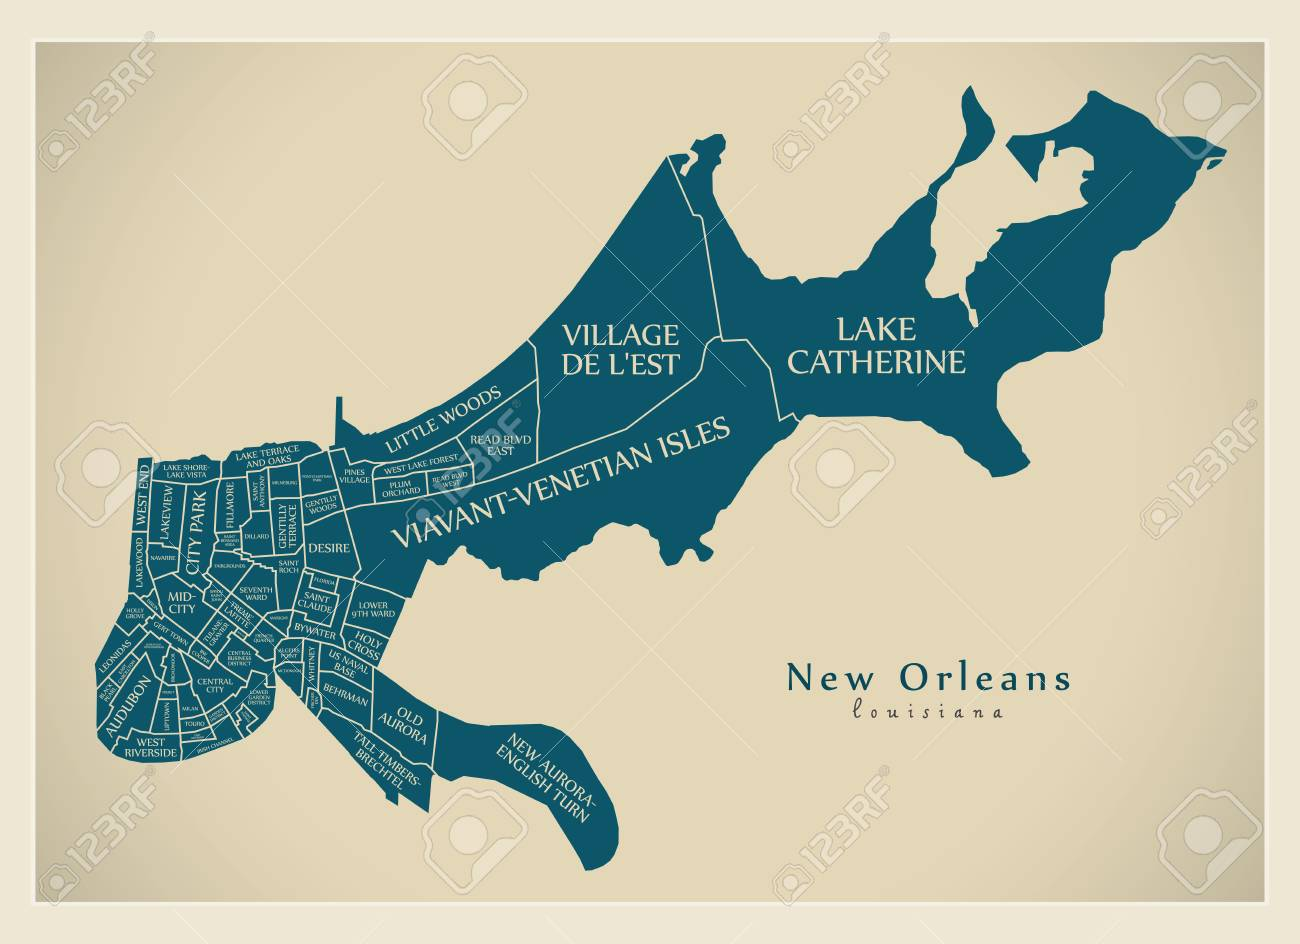 Modern City Map - New Orleans Louisiana city of the USA with.. on florida map, shreveport louisiana map, norco louisiana map, los angeles california map, atlanta georgia map, grand isle louisiana map, san francisco california map, louisiana on us map, bossier city louisiana map, covington louisiana map, philadelphia map, baton rouge zip code map, alabama louisiana map, gettysburg pennsylvania map, america louisiana purchase map, natchez map, southern louisiana map, montgomery alabama map, orleans parish map, new louisiana profile map,